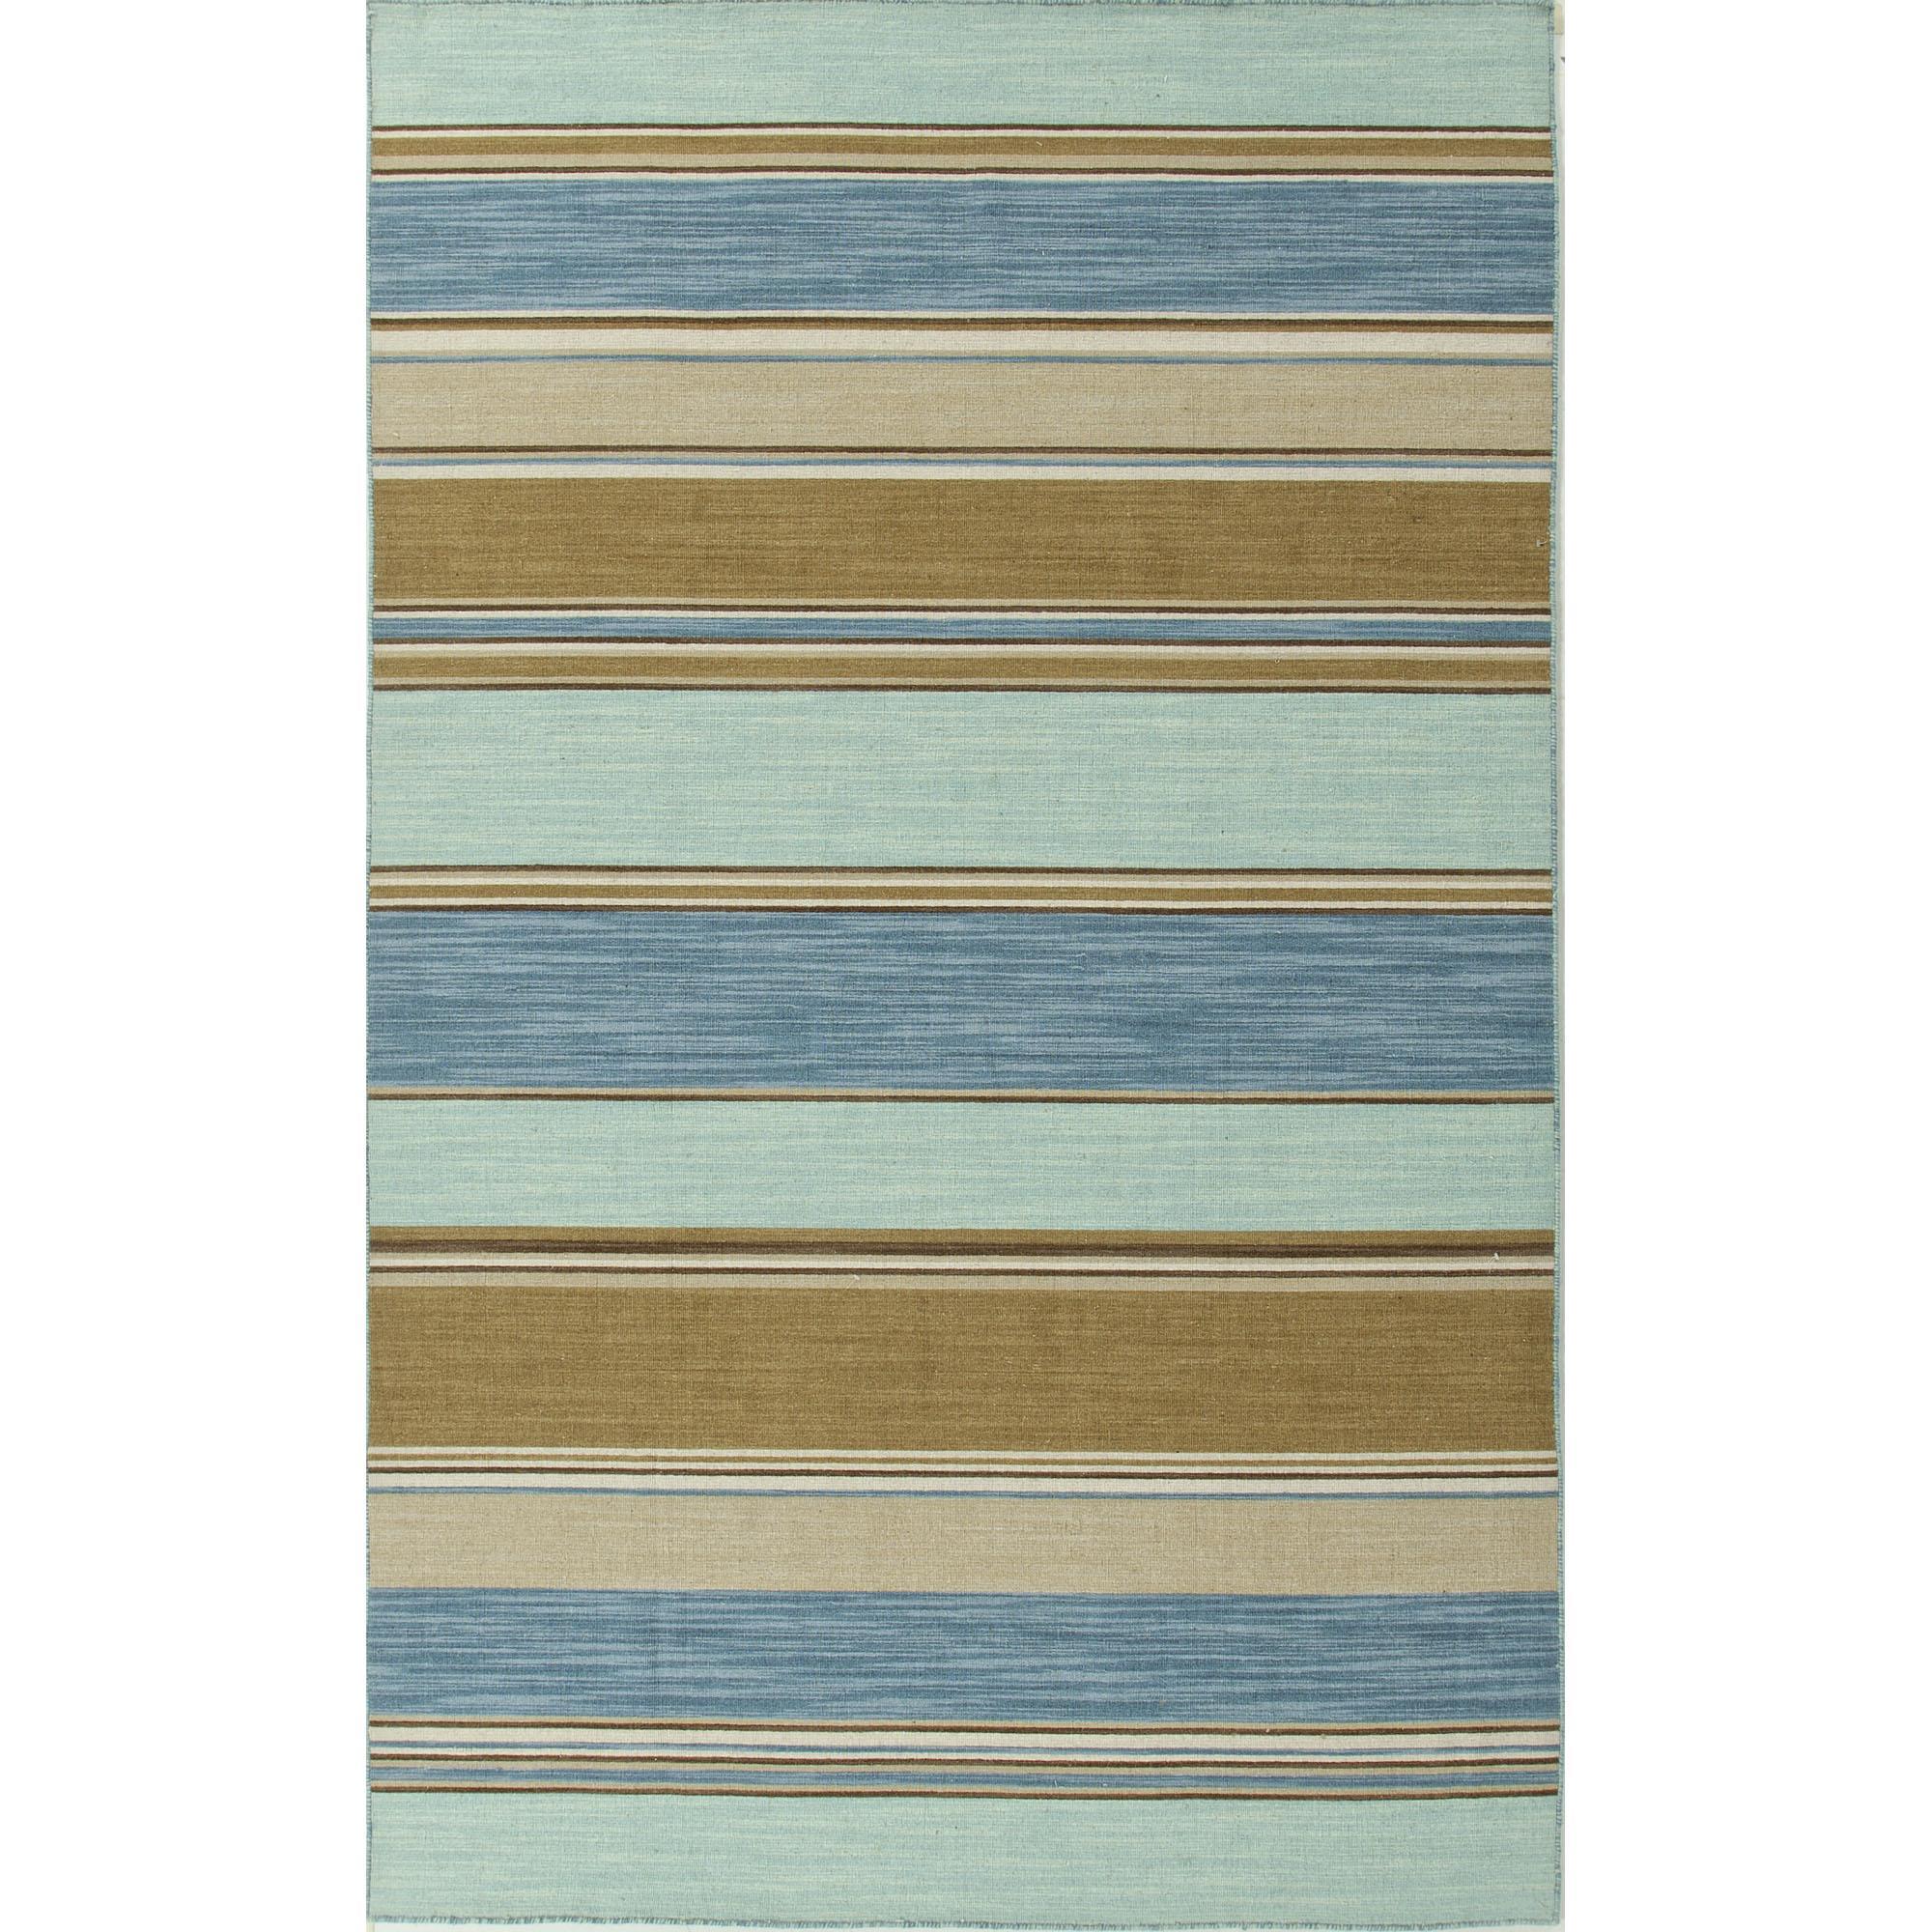 JAIPUR Rugs Coastal Shores 10 x 14 Rug - Item Number: RUG122434